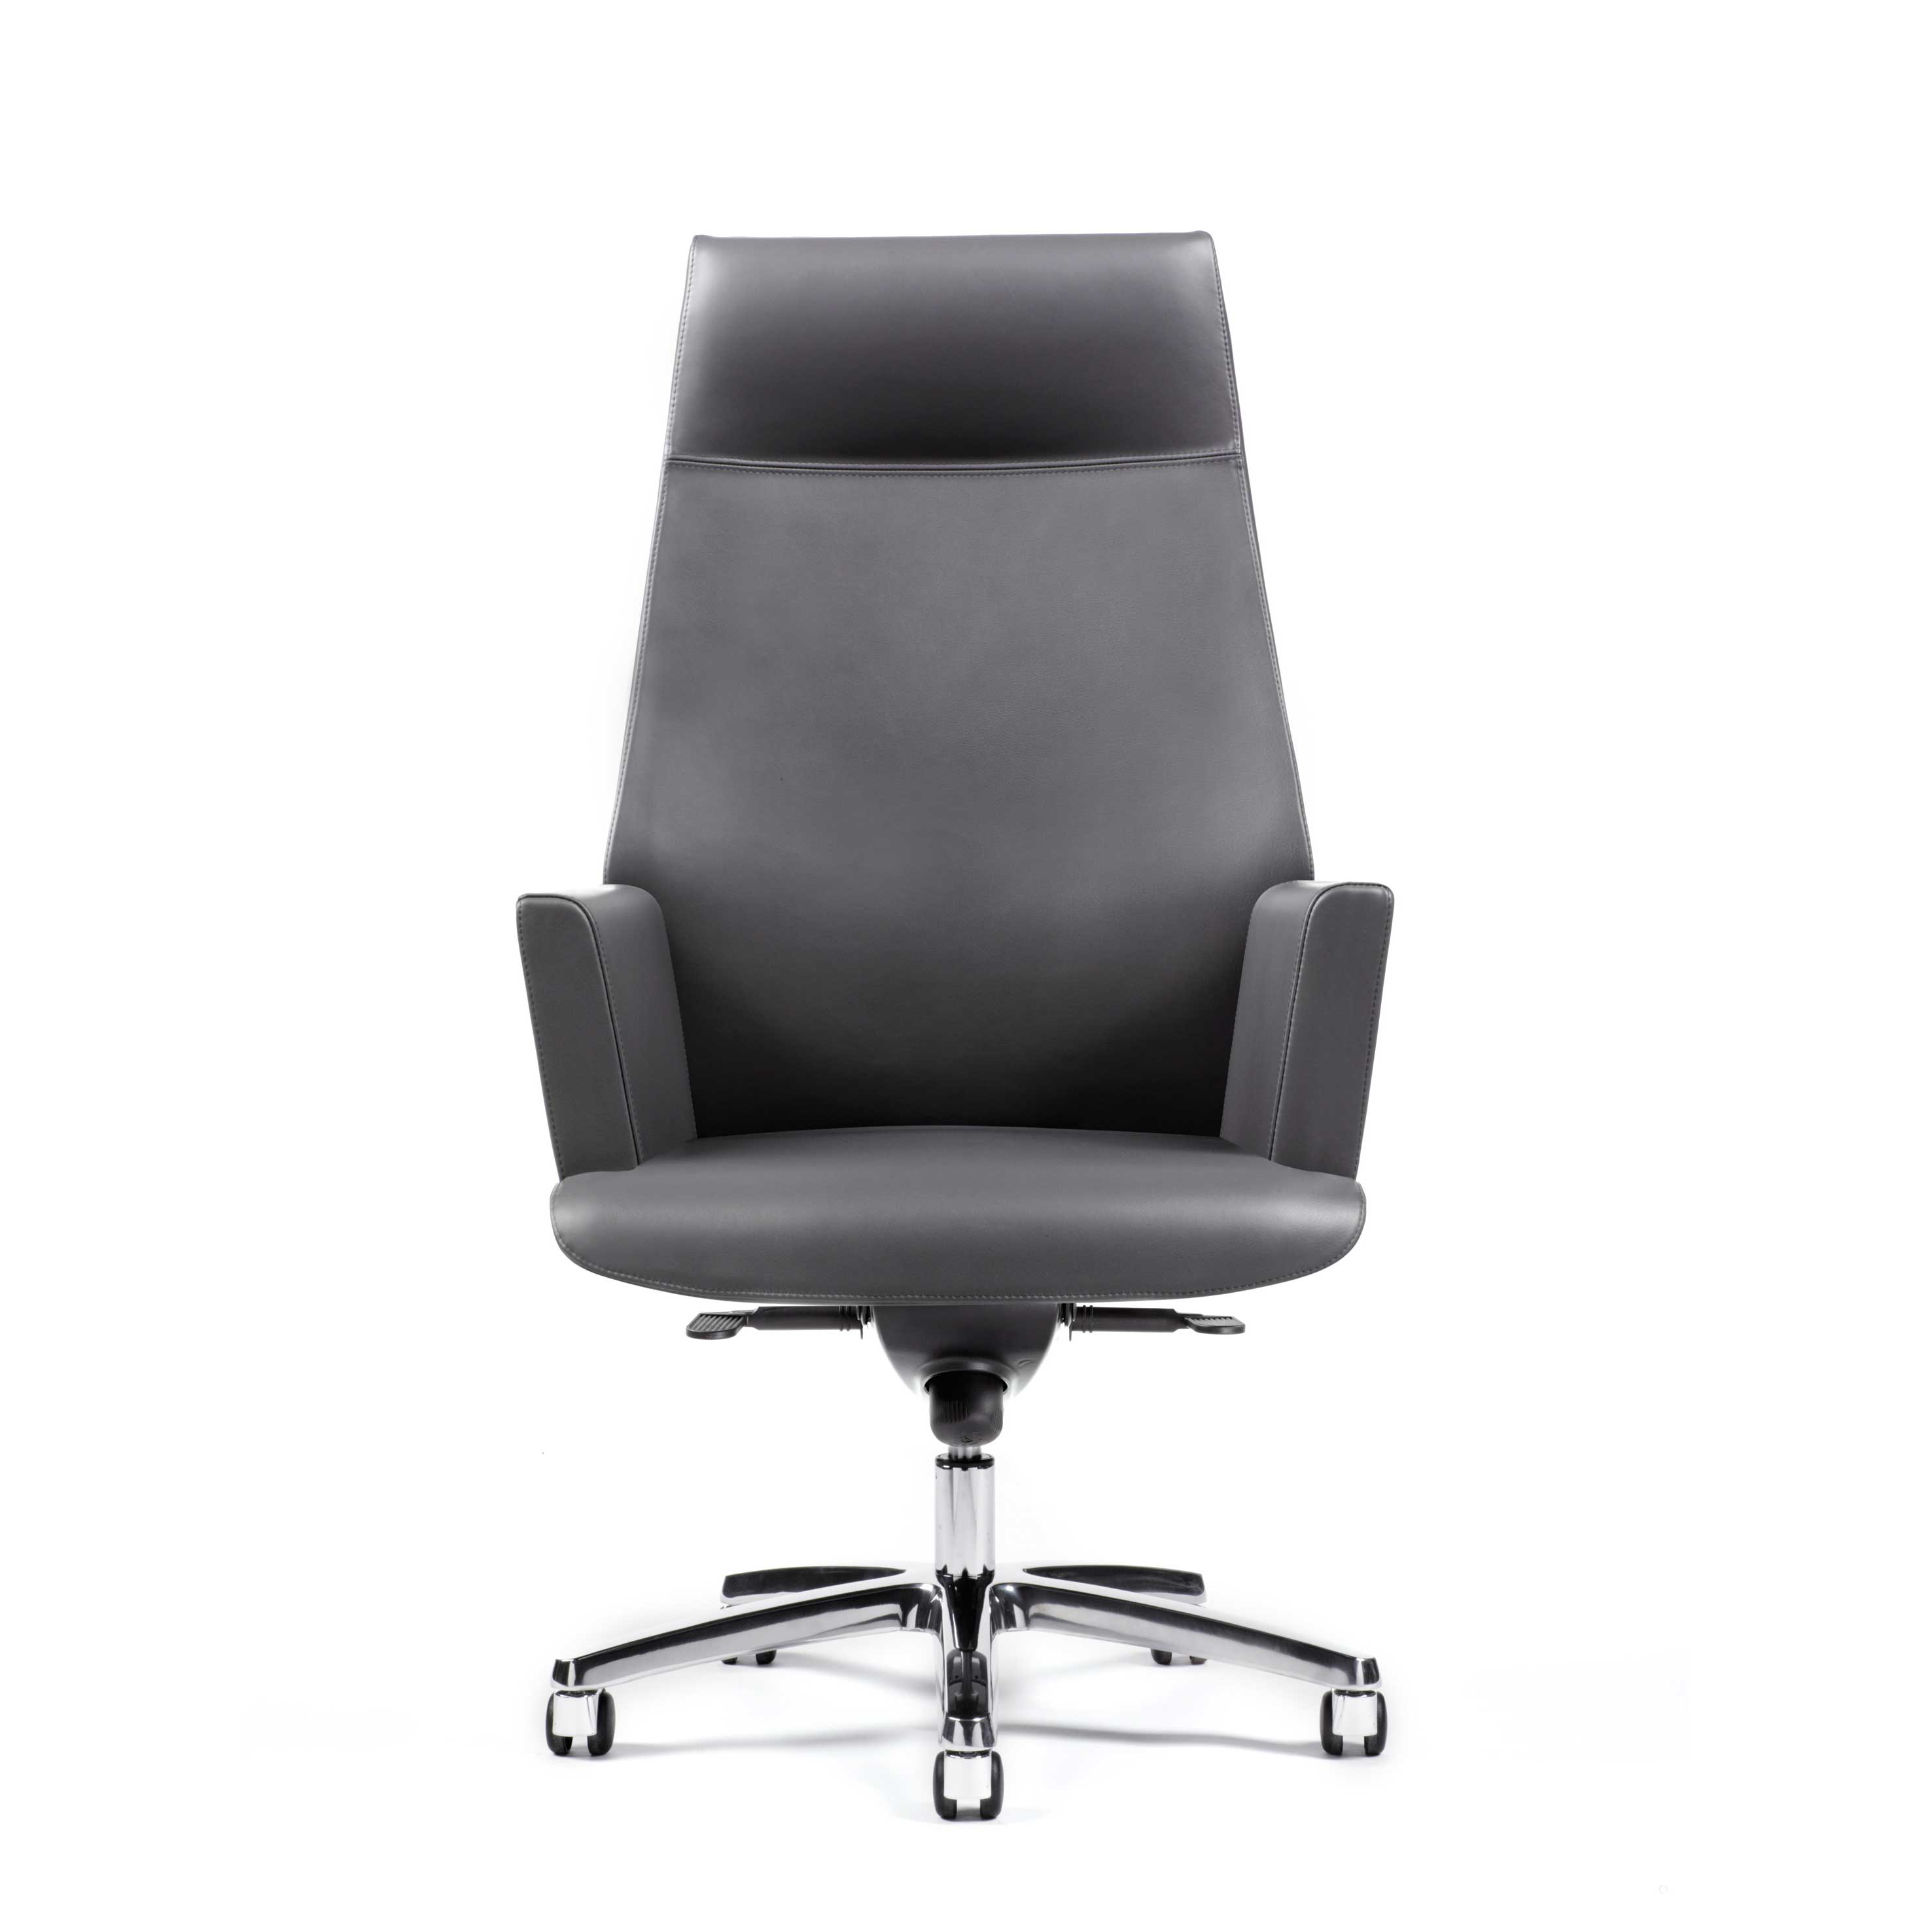 07S_Estel_Comfort&Relax_Office-Chair_Tua